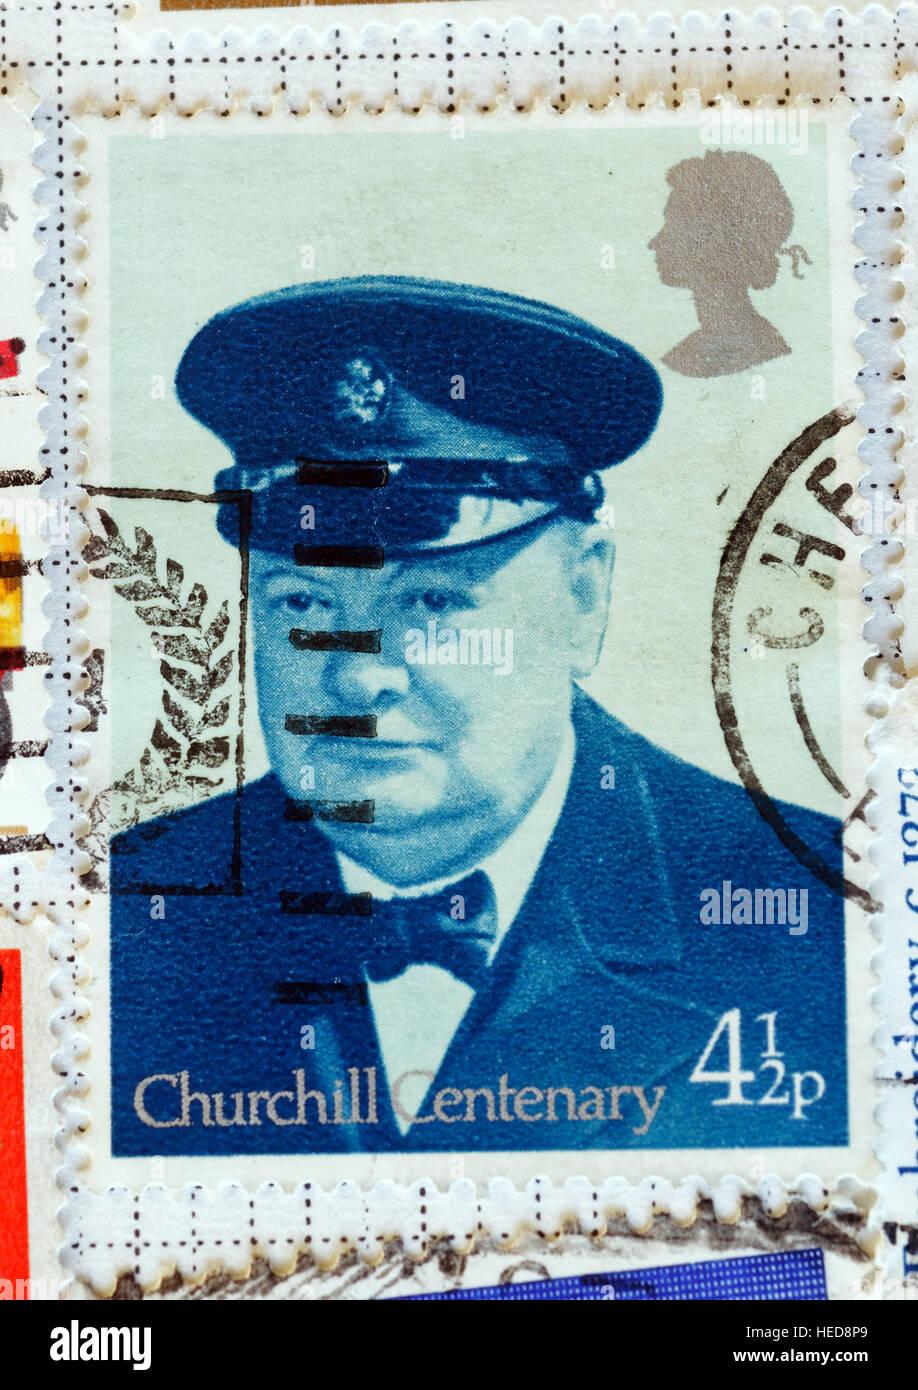 Winston Churchill centenary stamp from 1974 - Stock Image